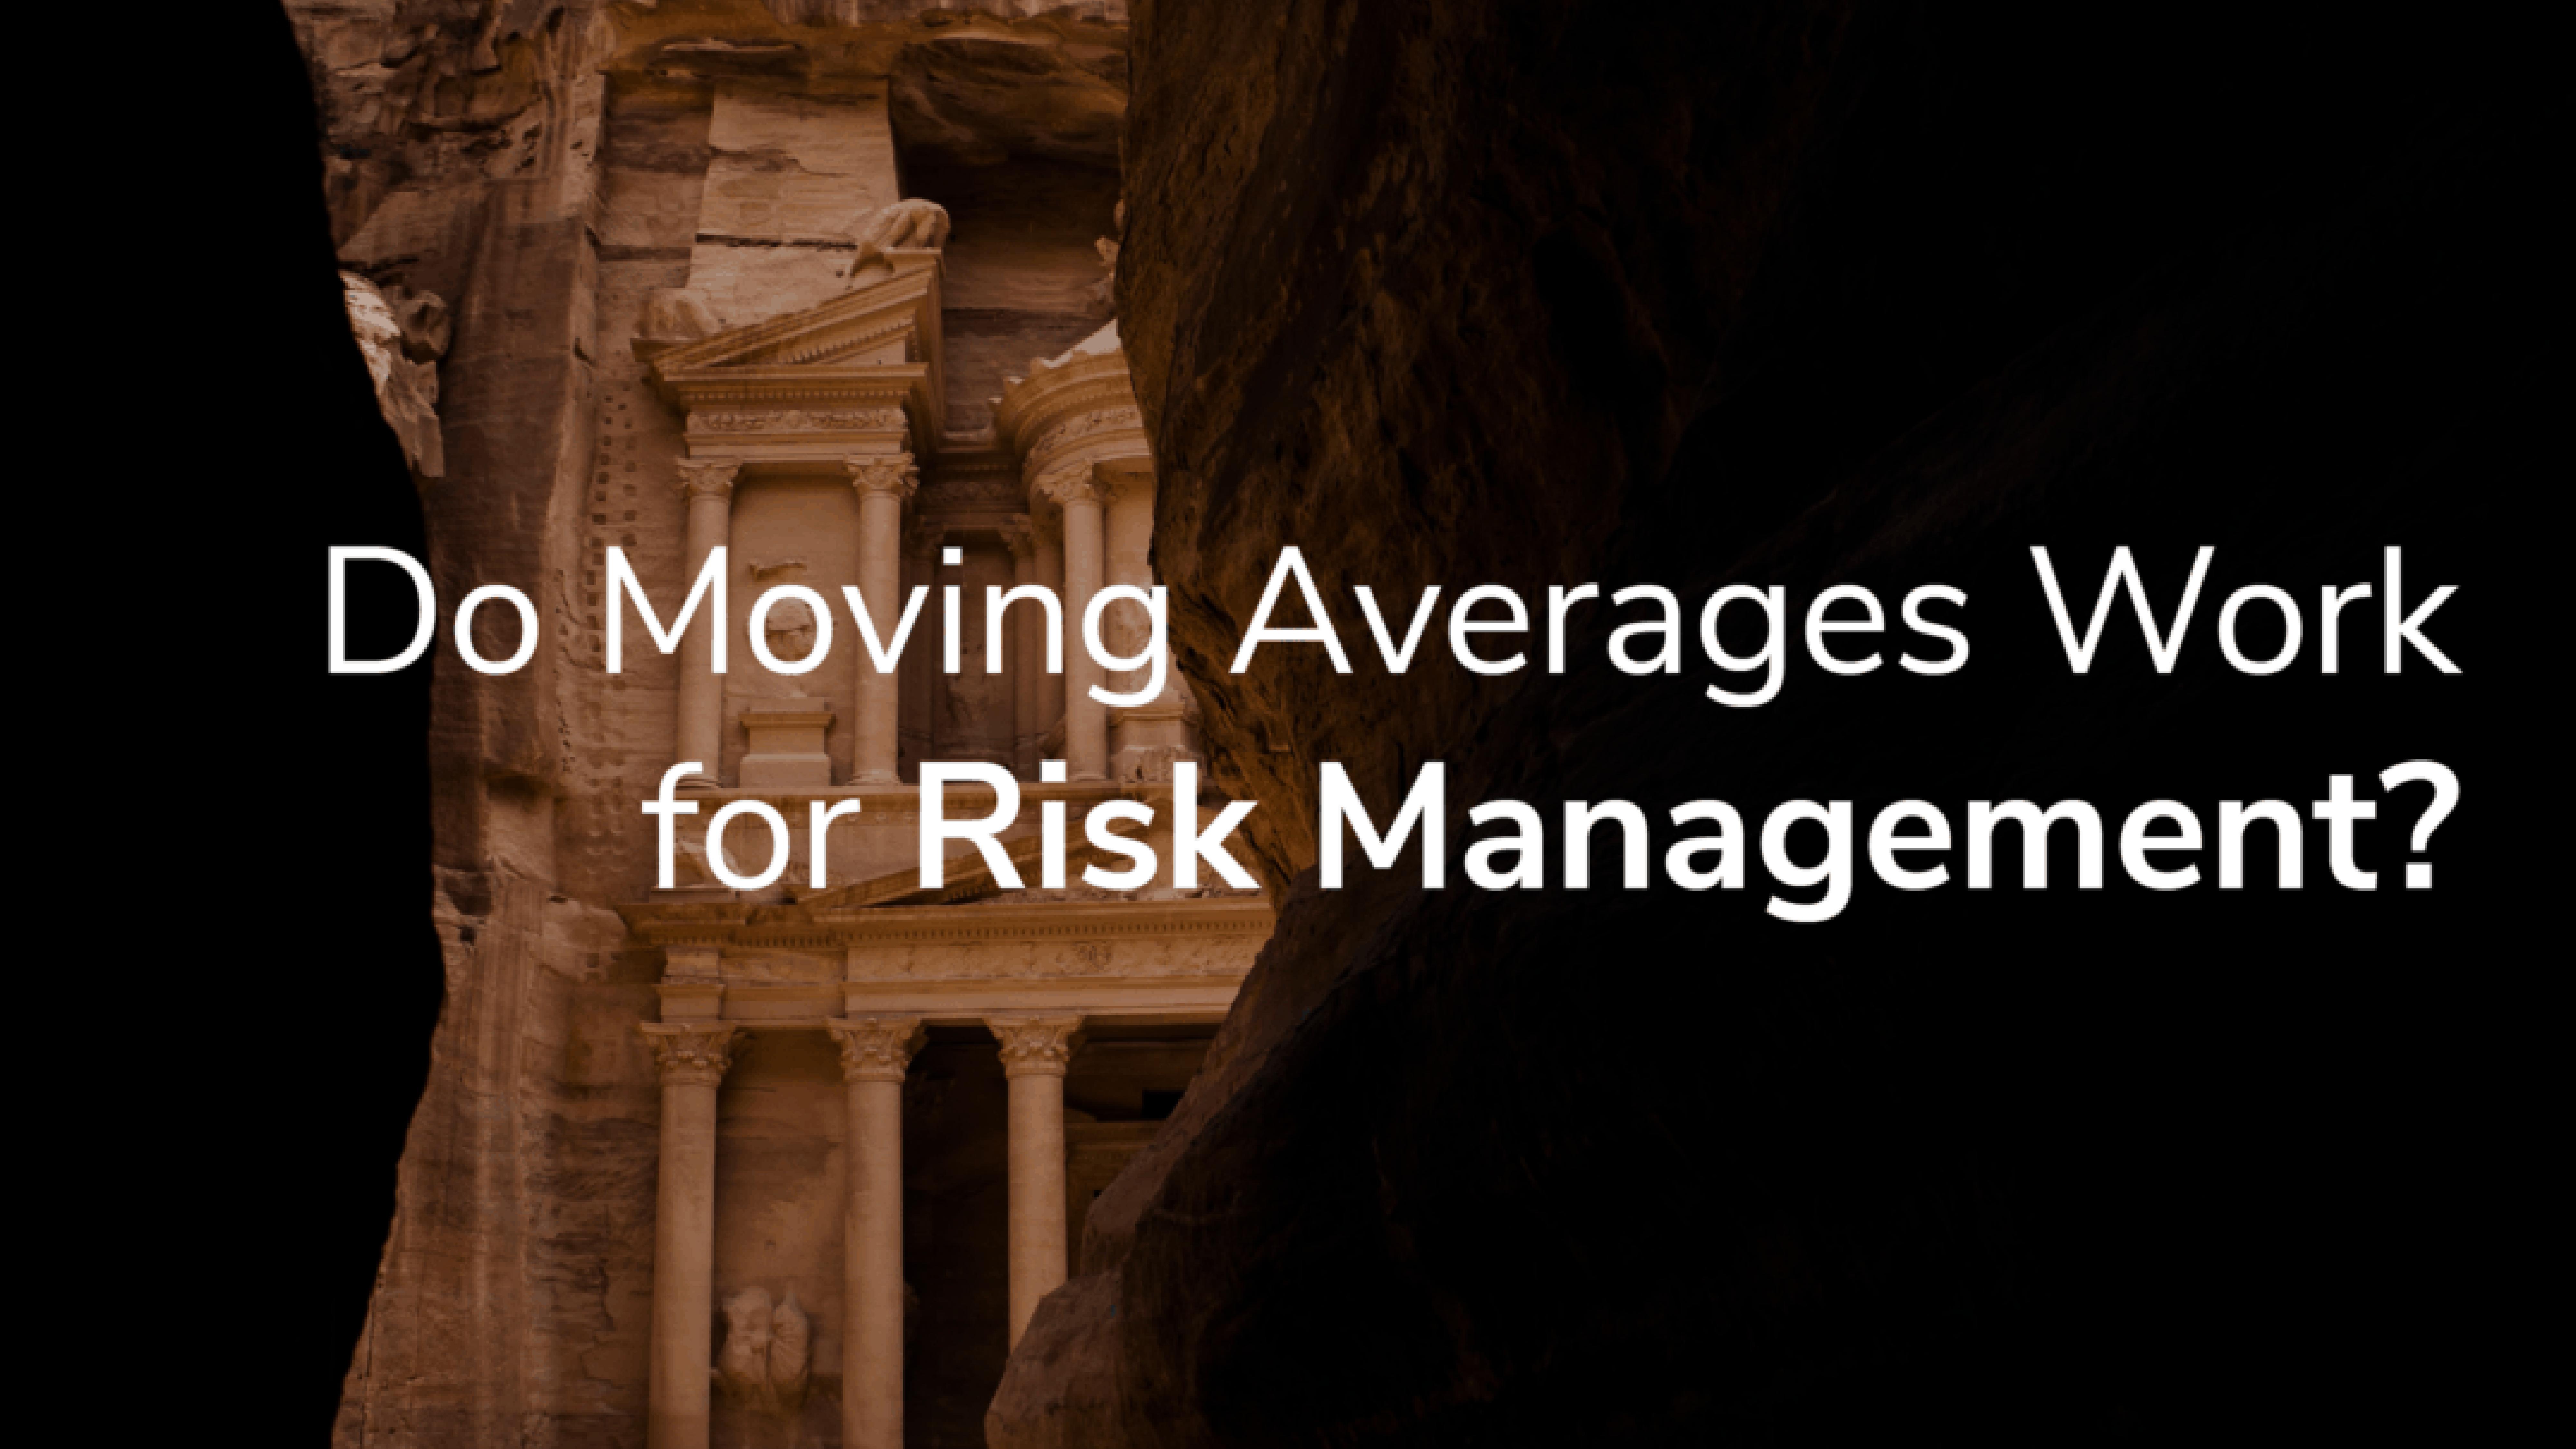 Do Moving Averages Work for Risk Management?